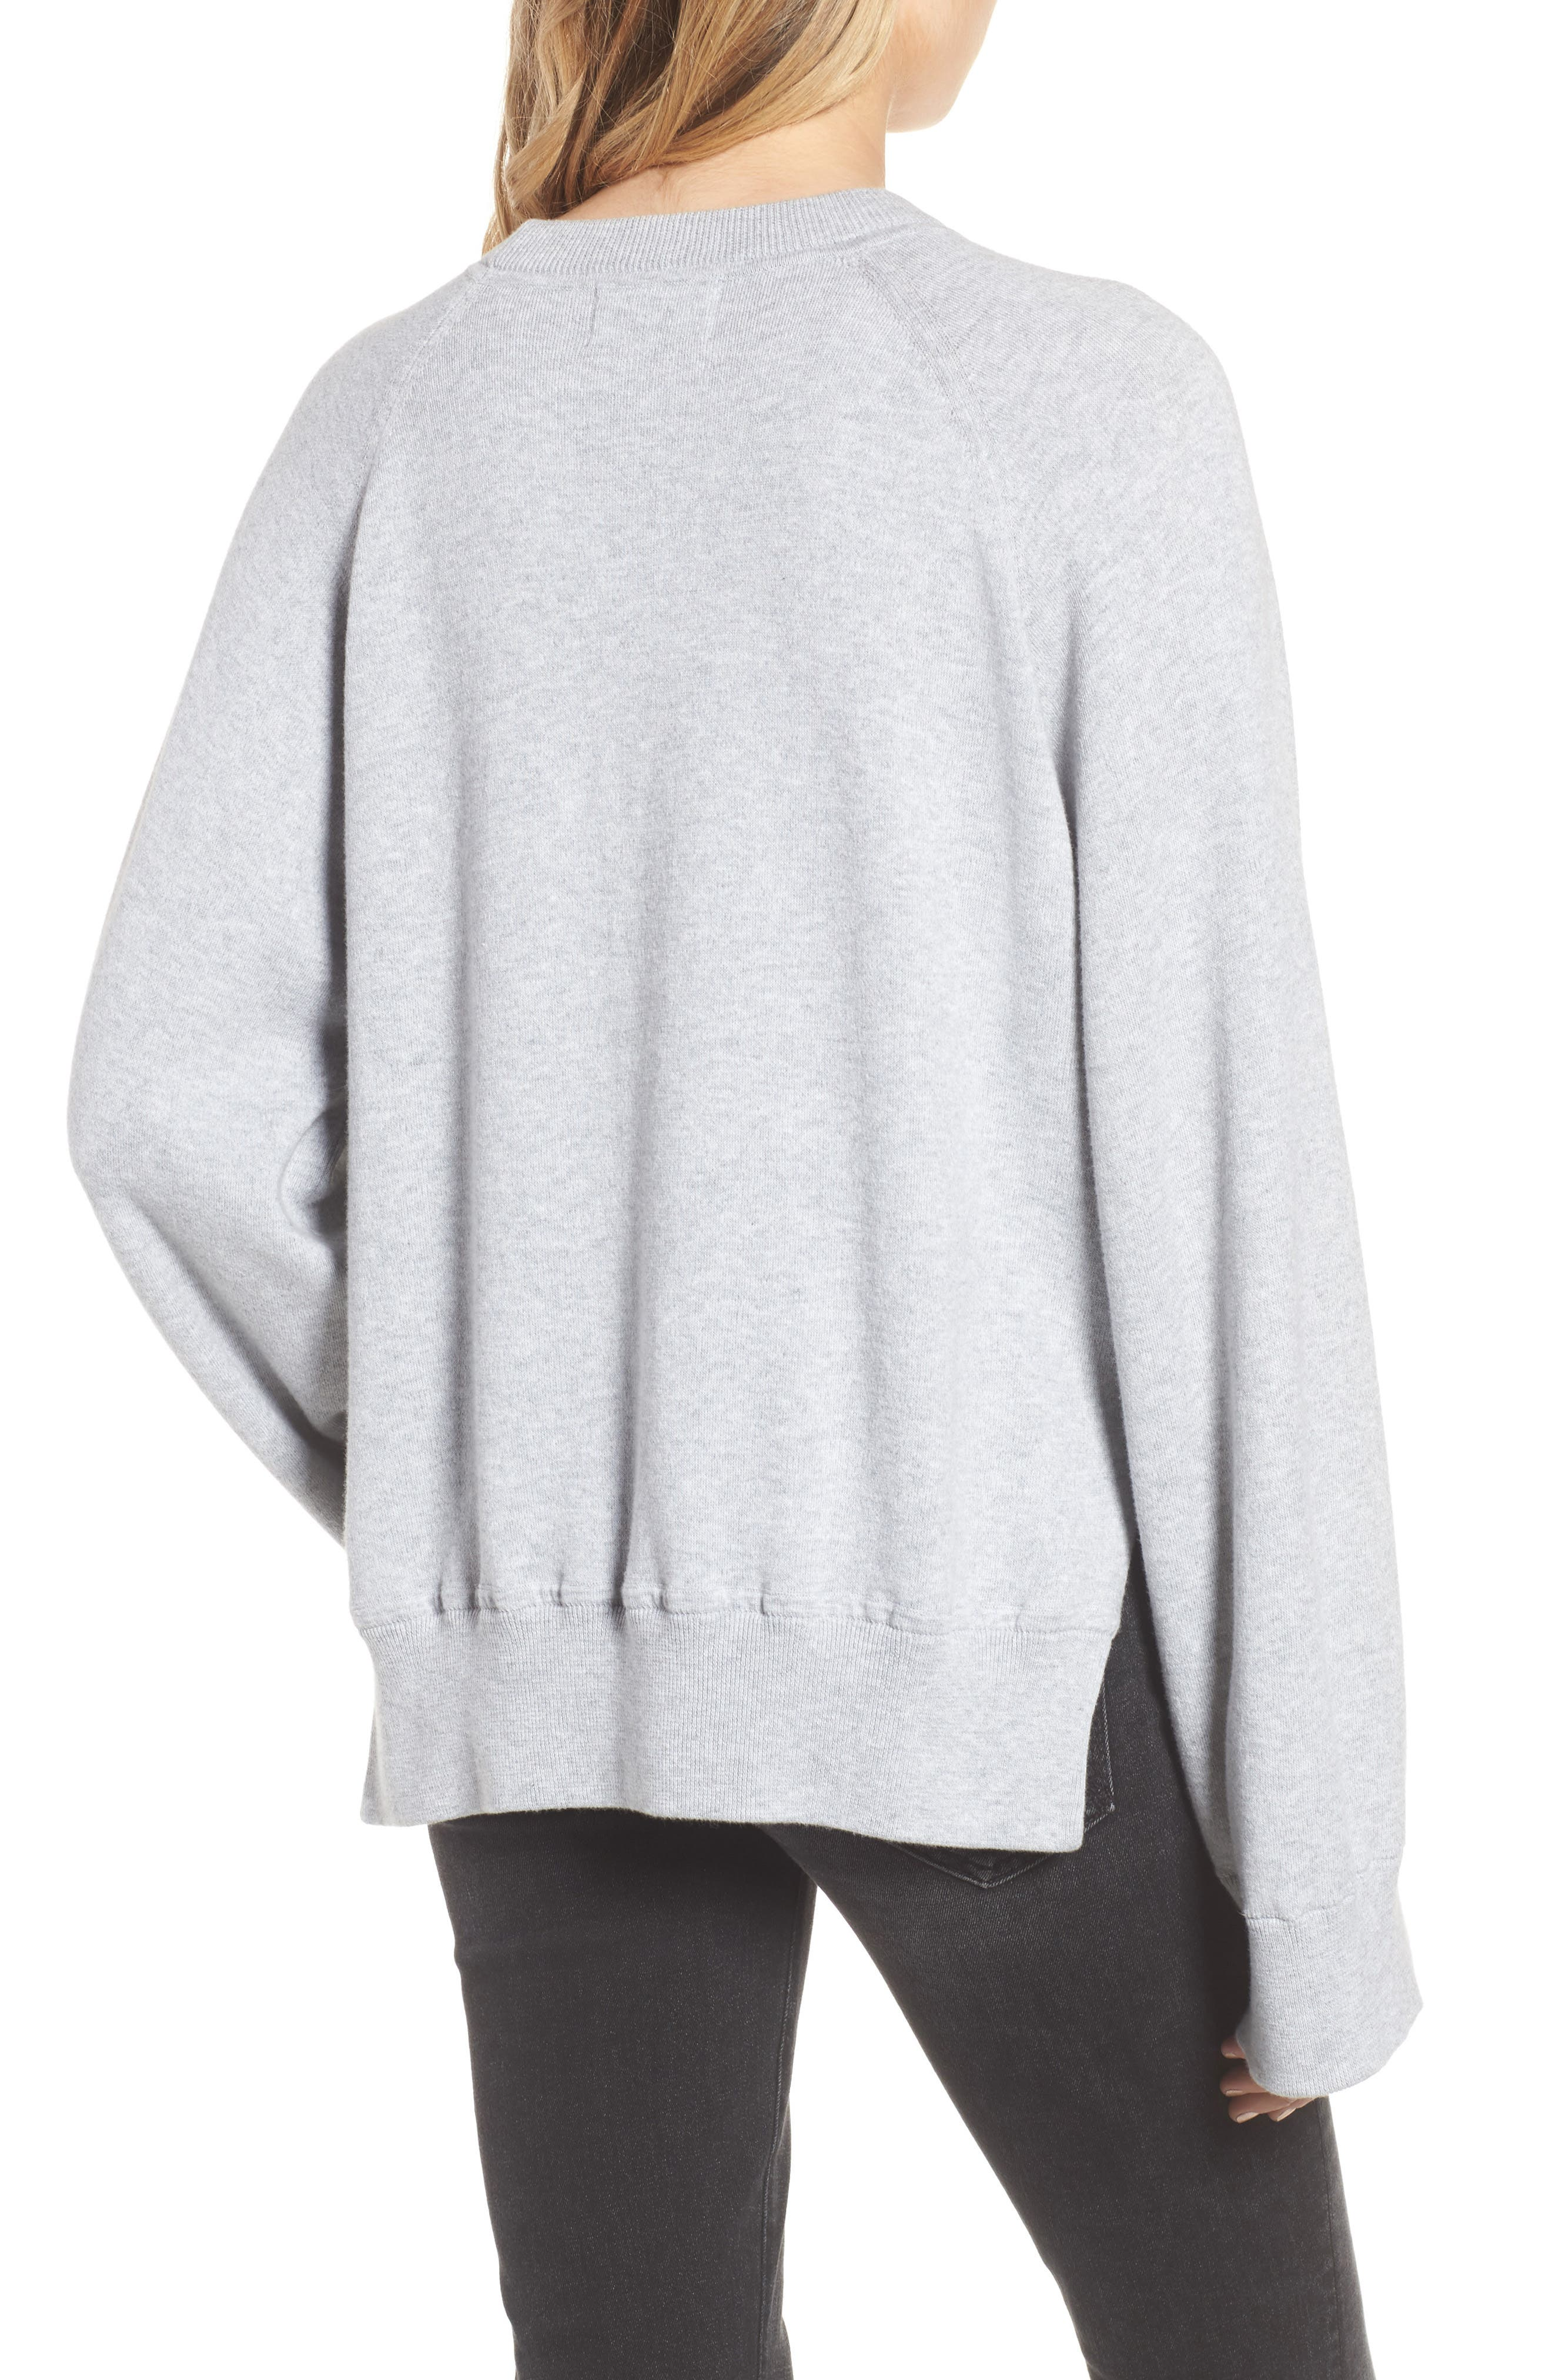 Lea Sweatshirt,                             Alternate thumbnail 2, color,                             Grey